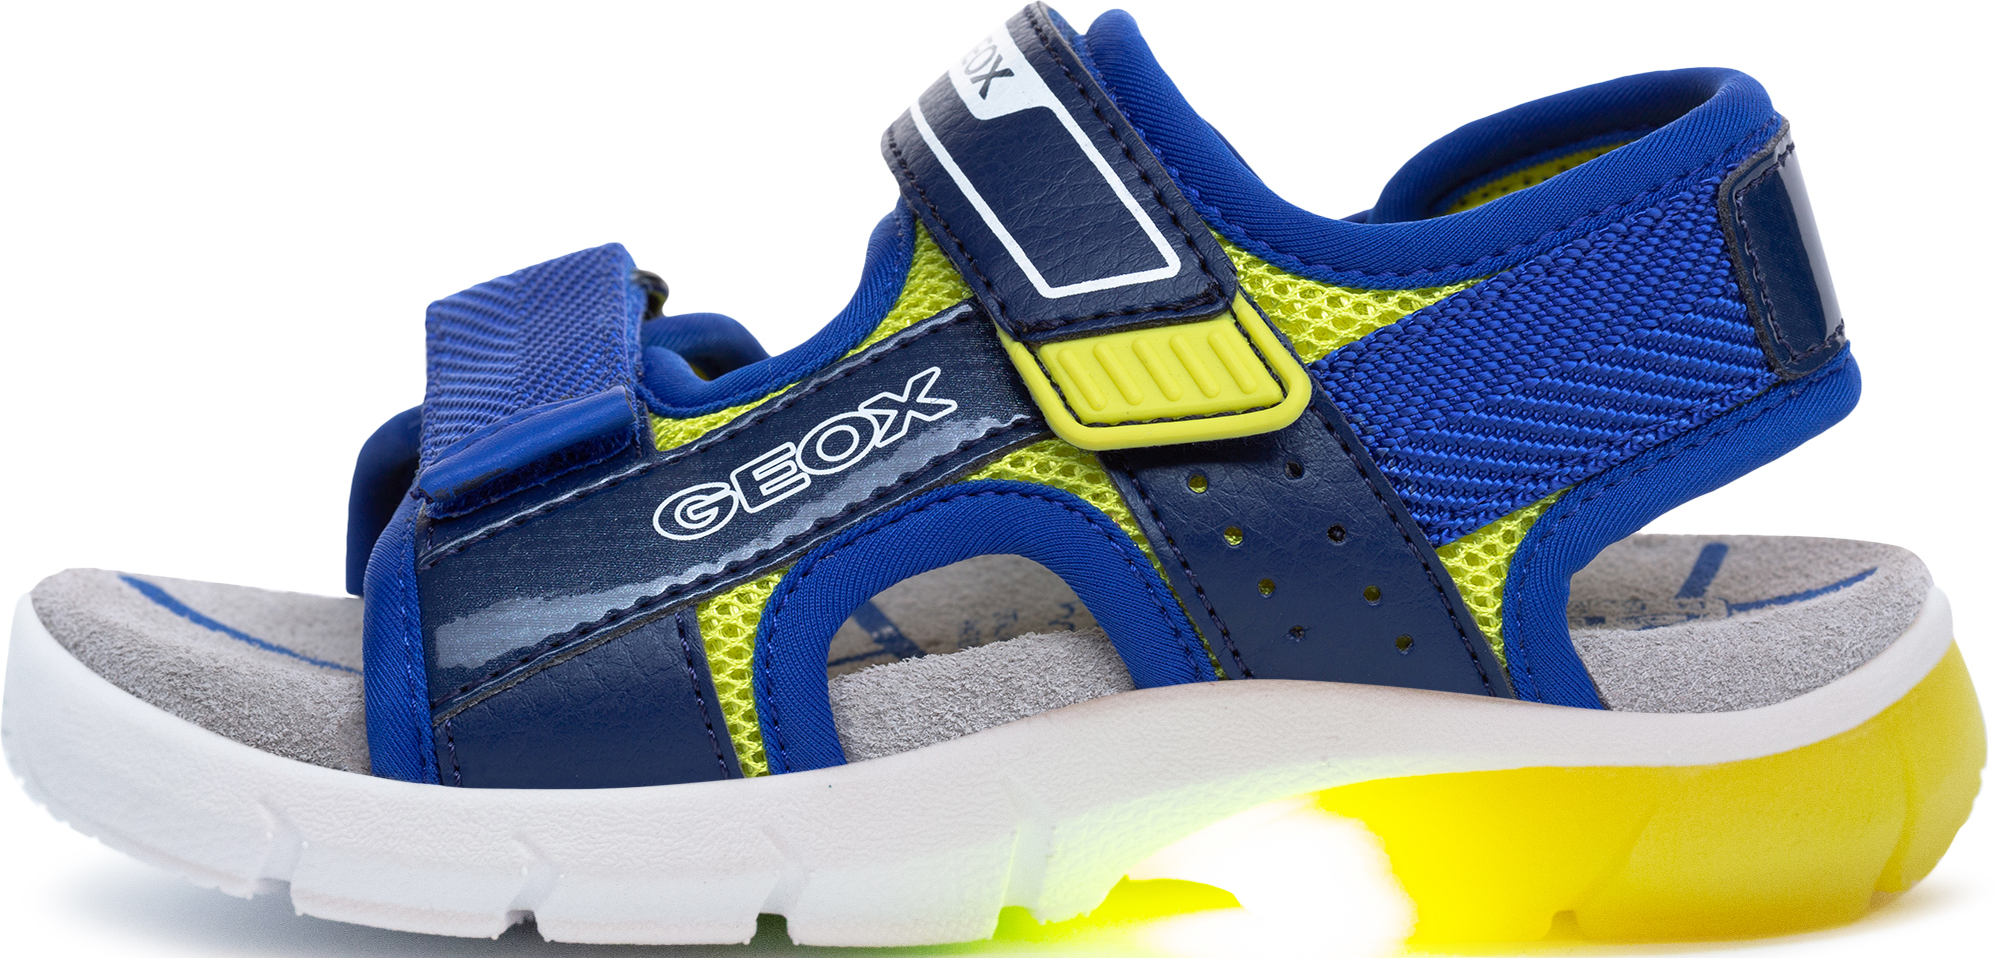 Geox Сандалии для мальчиков Geox Flexyper, размер 34 geox сандалии для мальчика geox